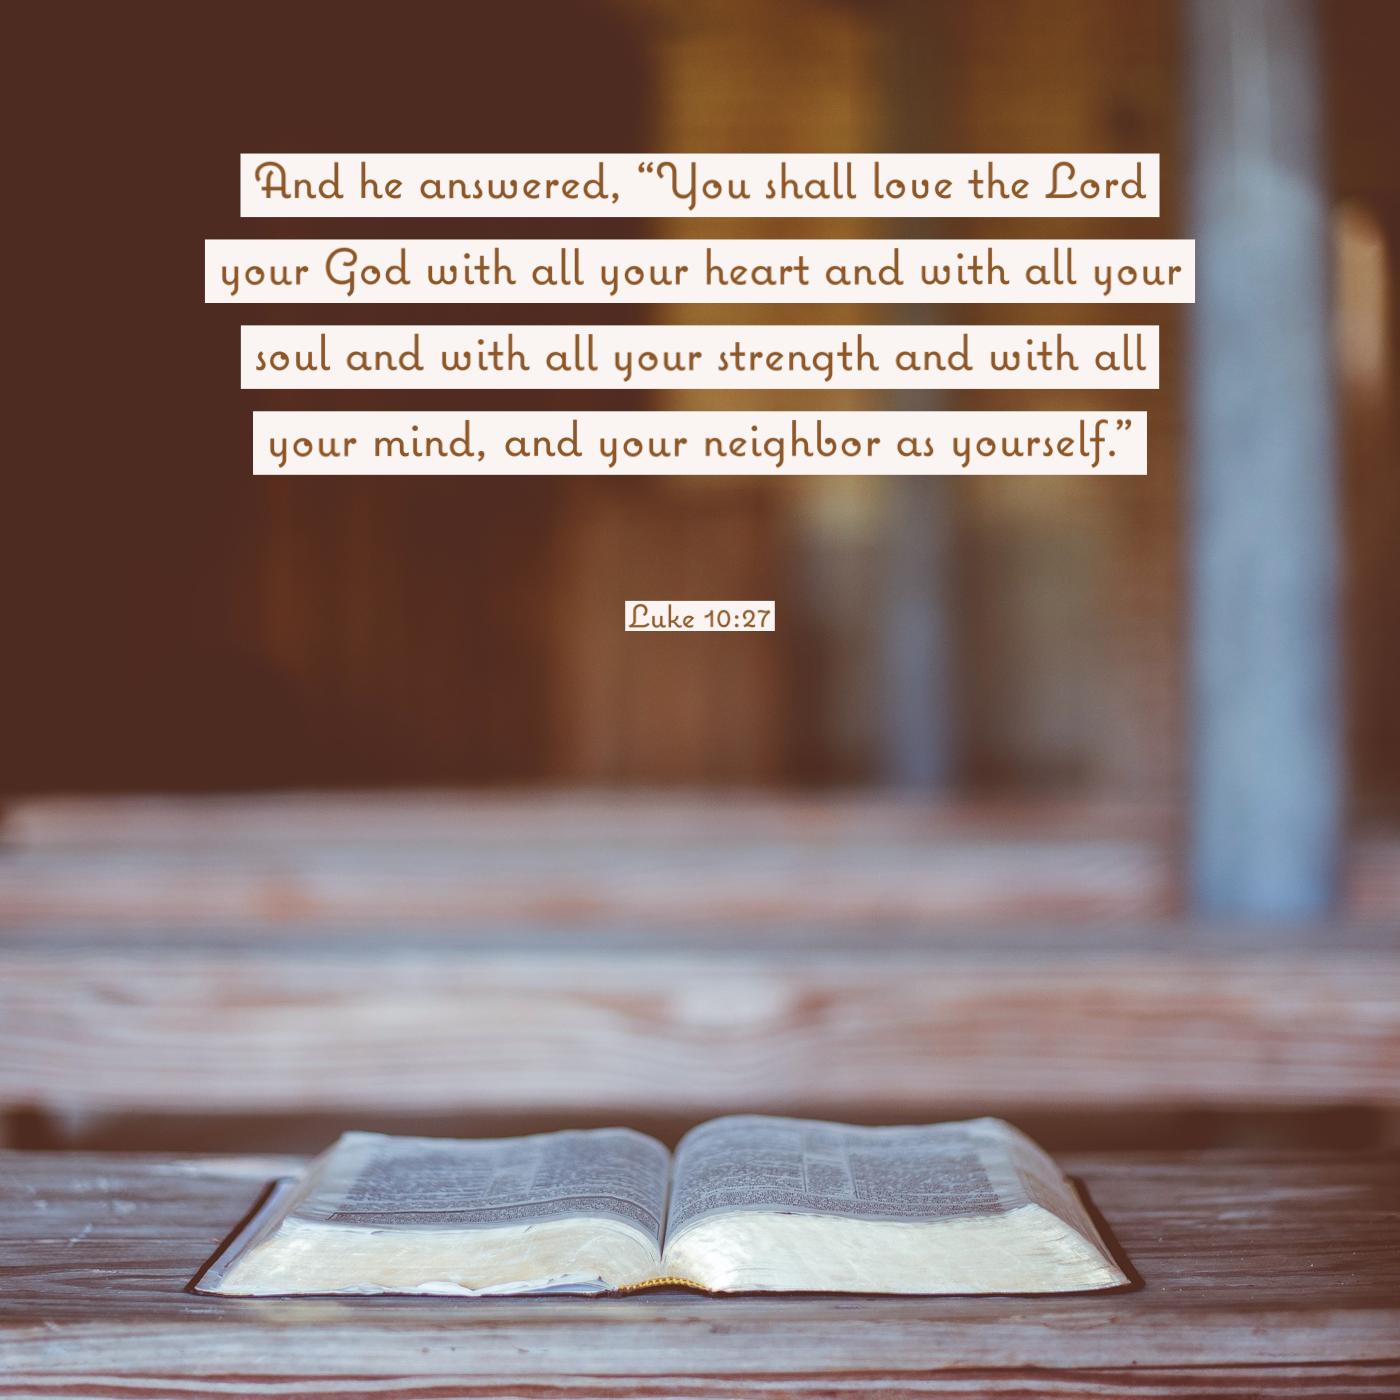 Lenten Devotional – Tuesday of Holy Week